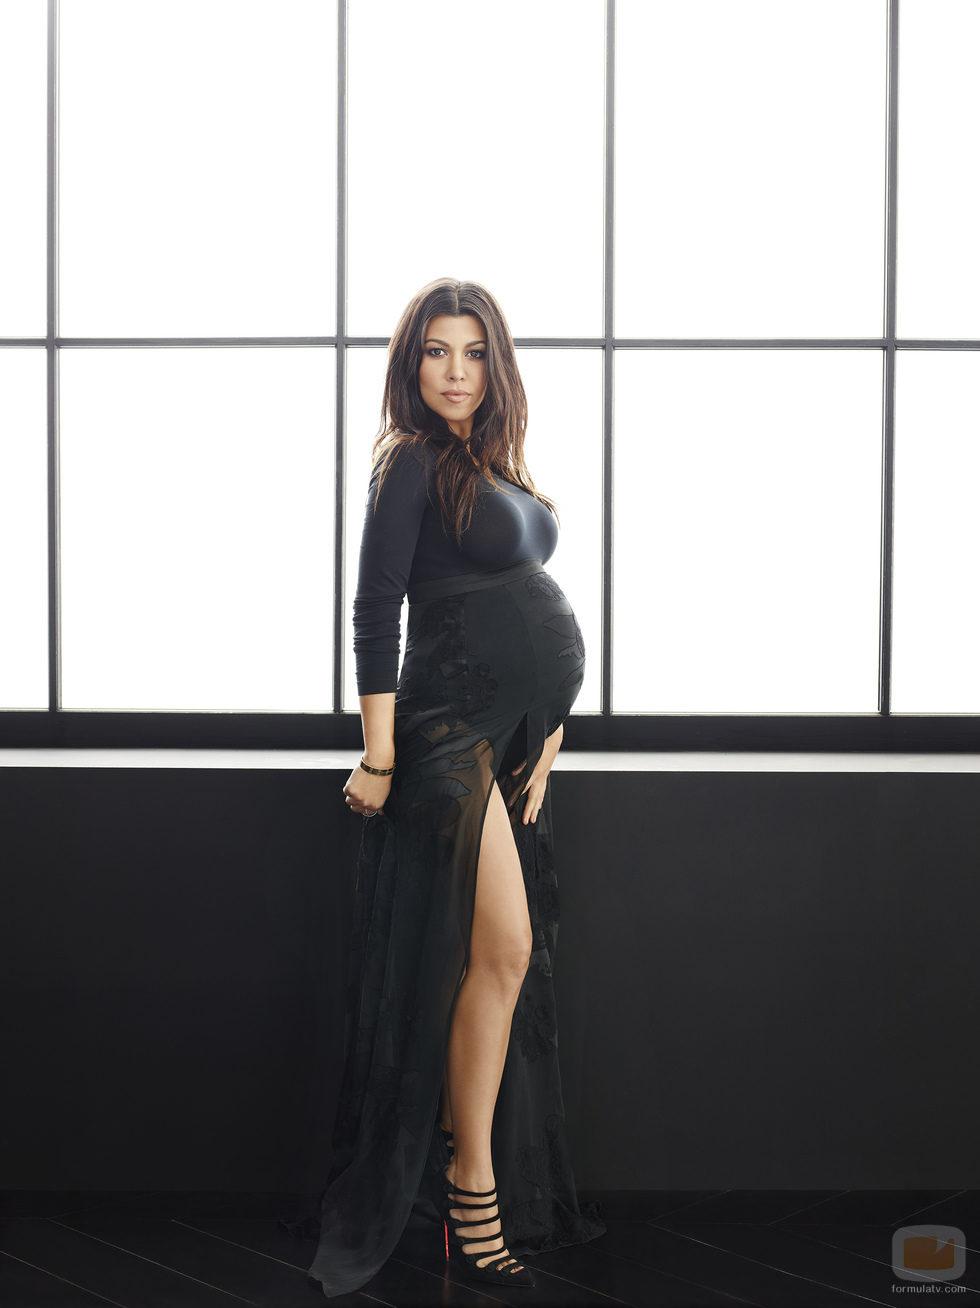 Kourtney Kardashian, embarazada, posa enseñando la pierna ...